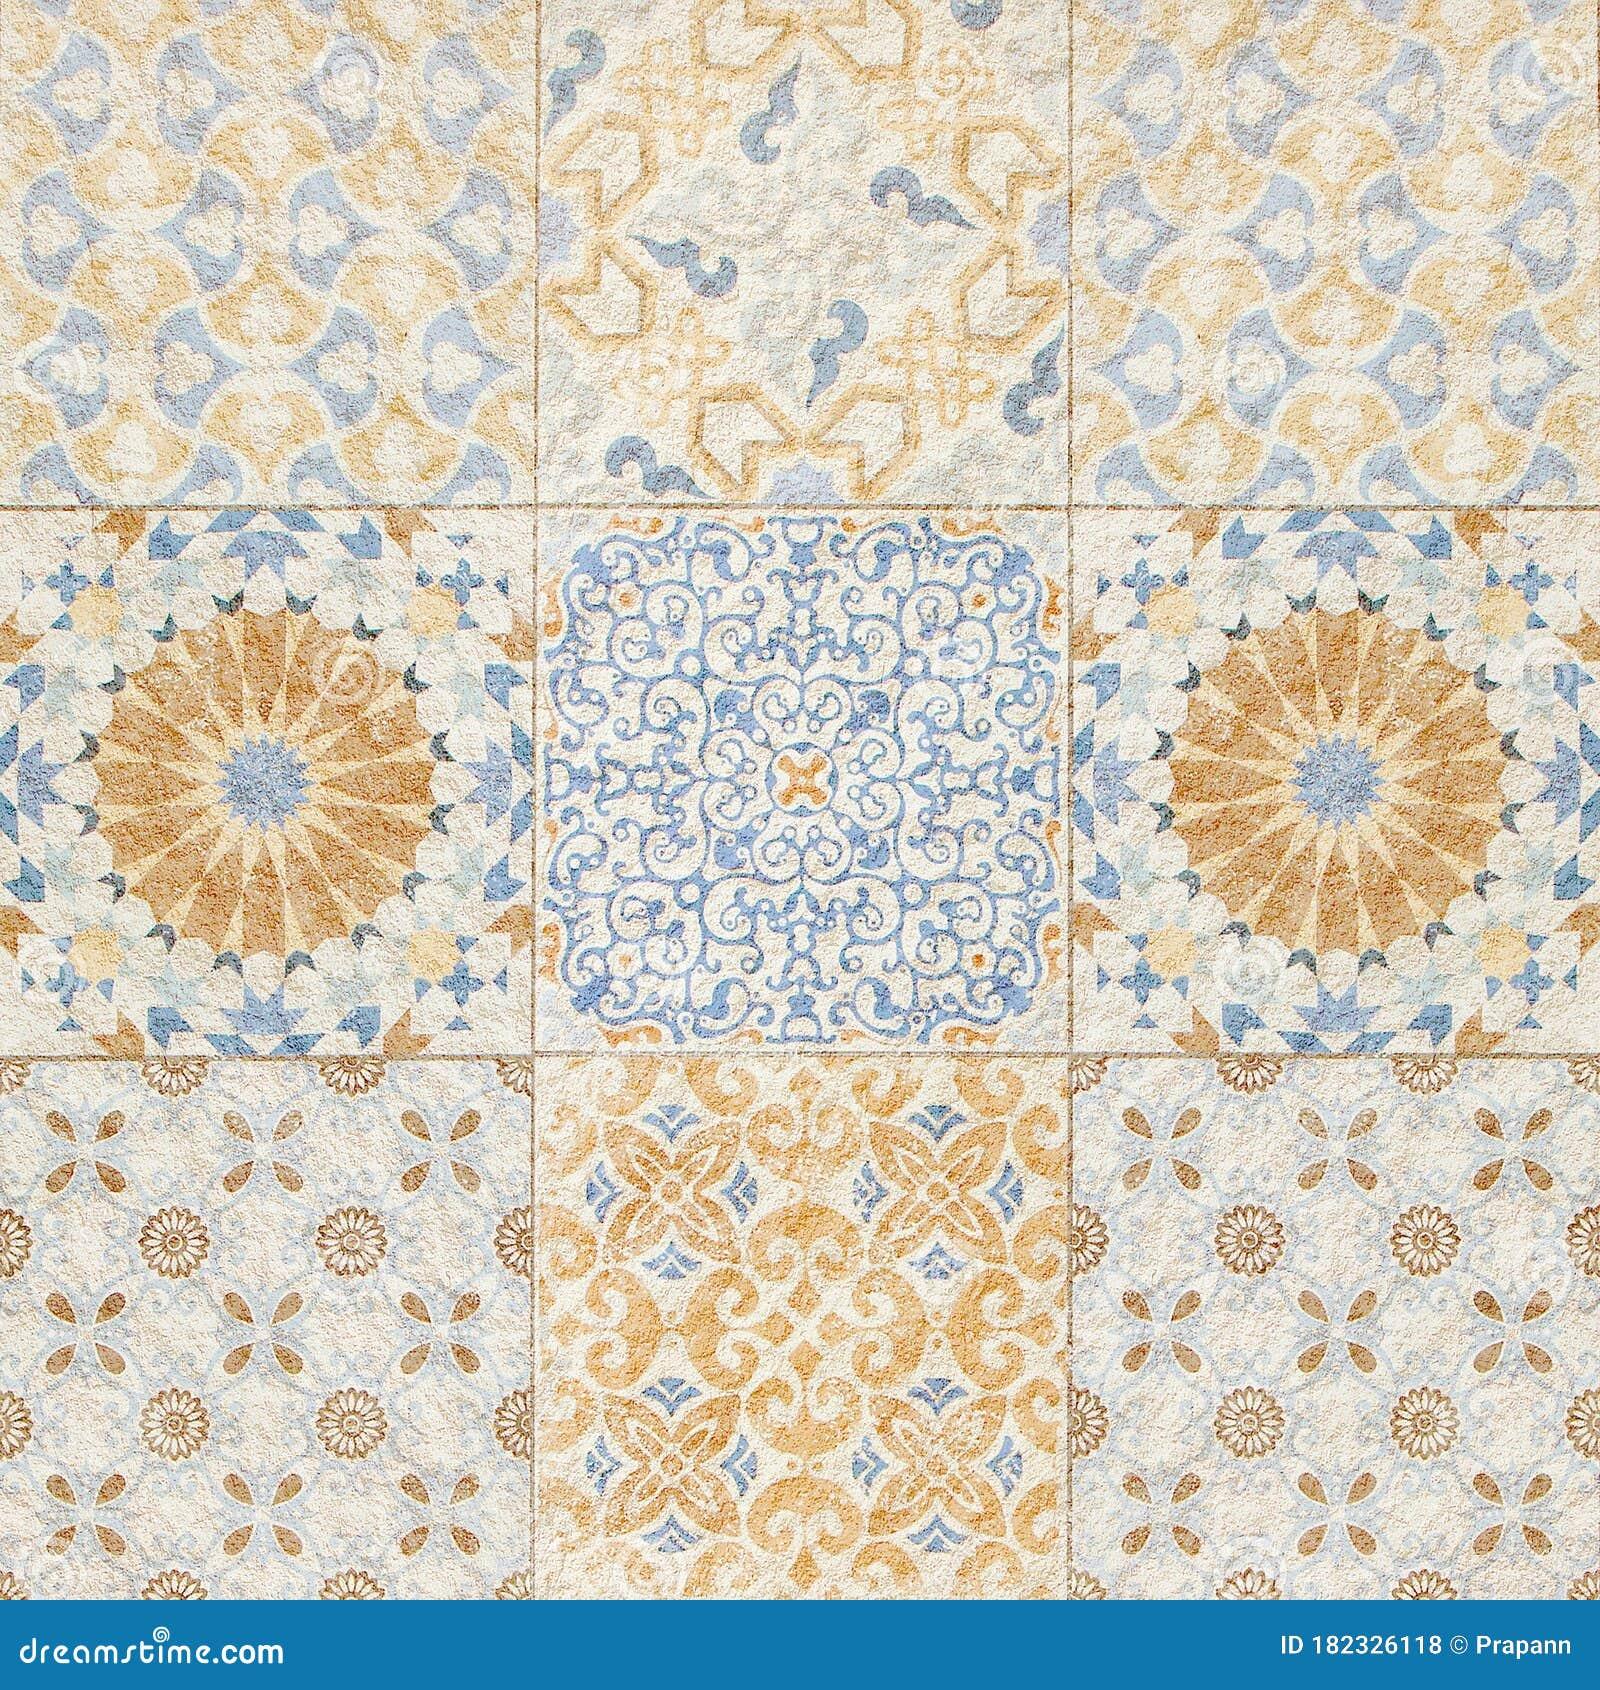 A Colorful Vintage Ceramic Tiles Wall Decoration Stock Photo Image Of Design Vintage 182326118